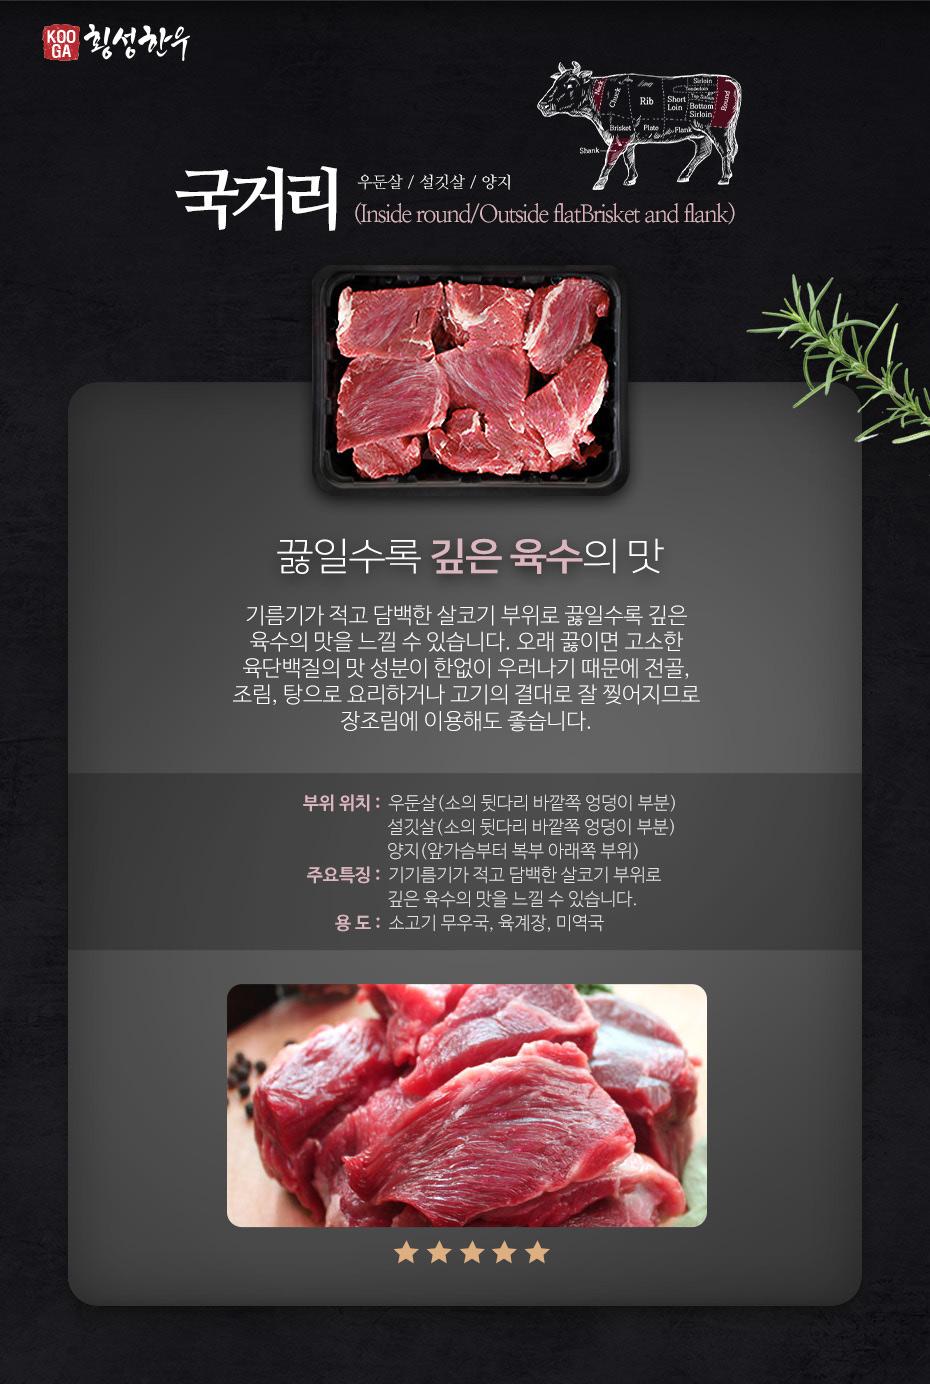 meat_kind_kookgeori_150020.jpg